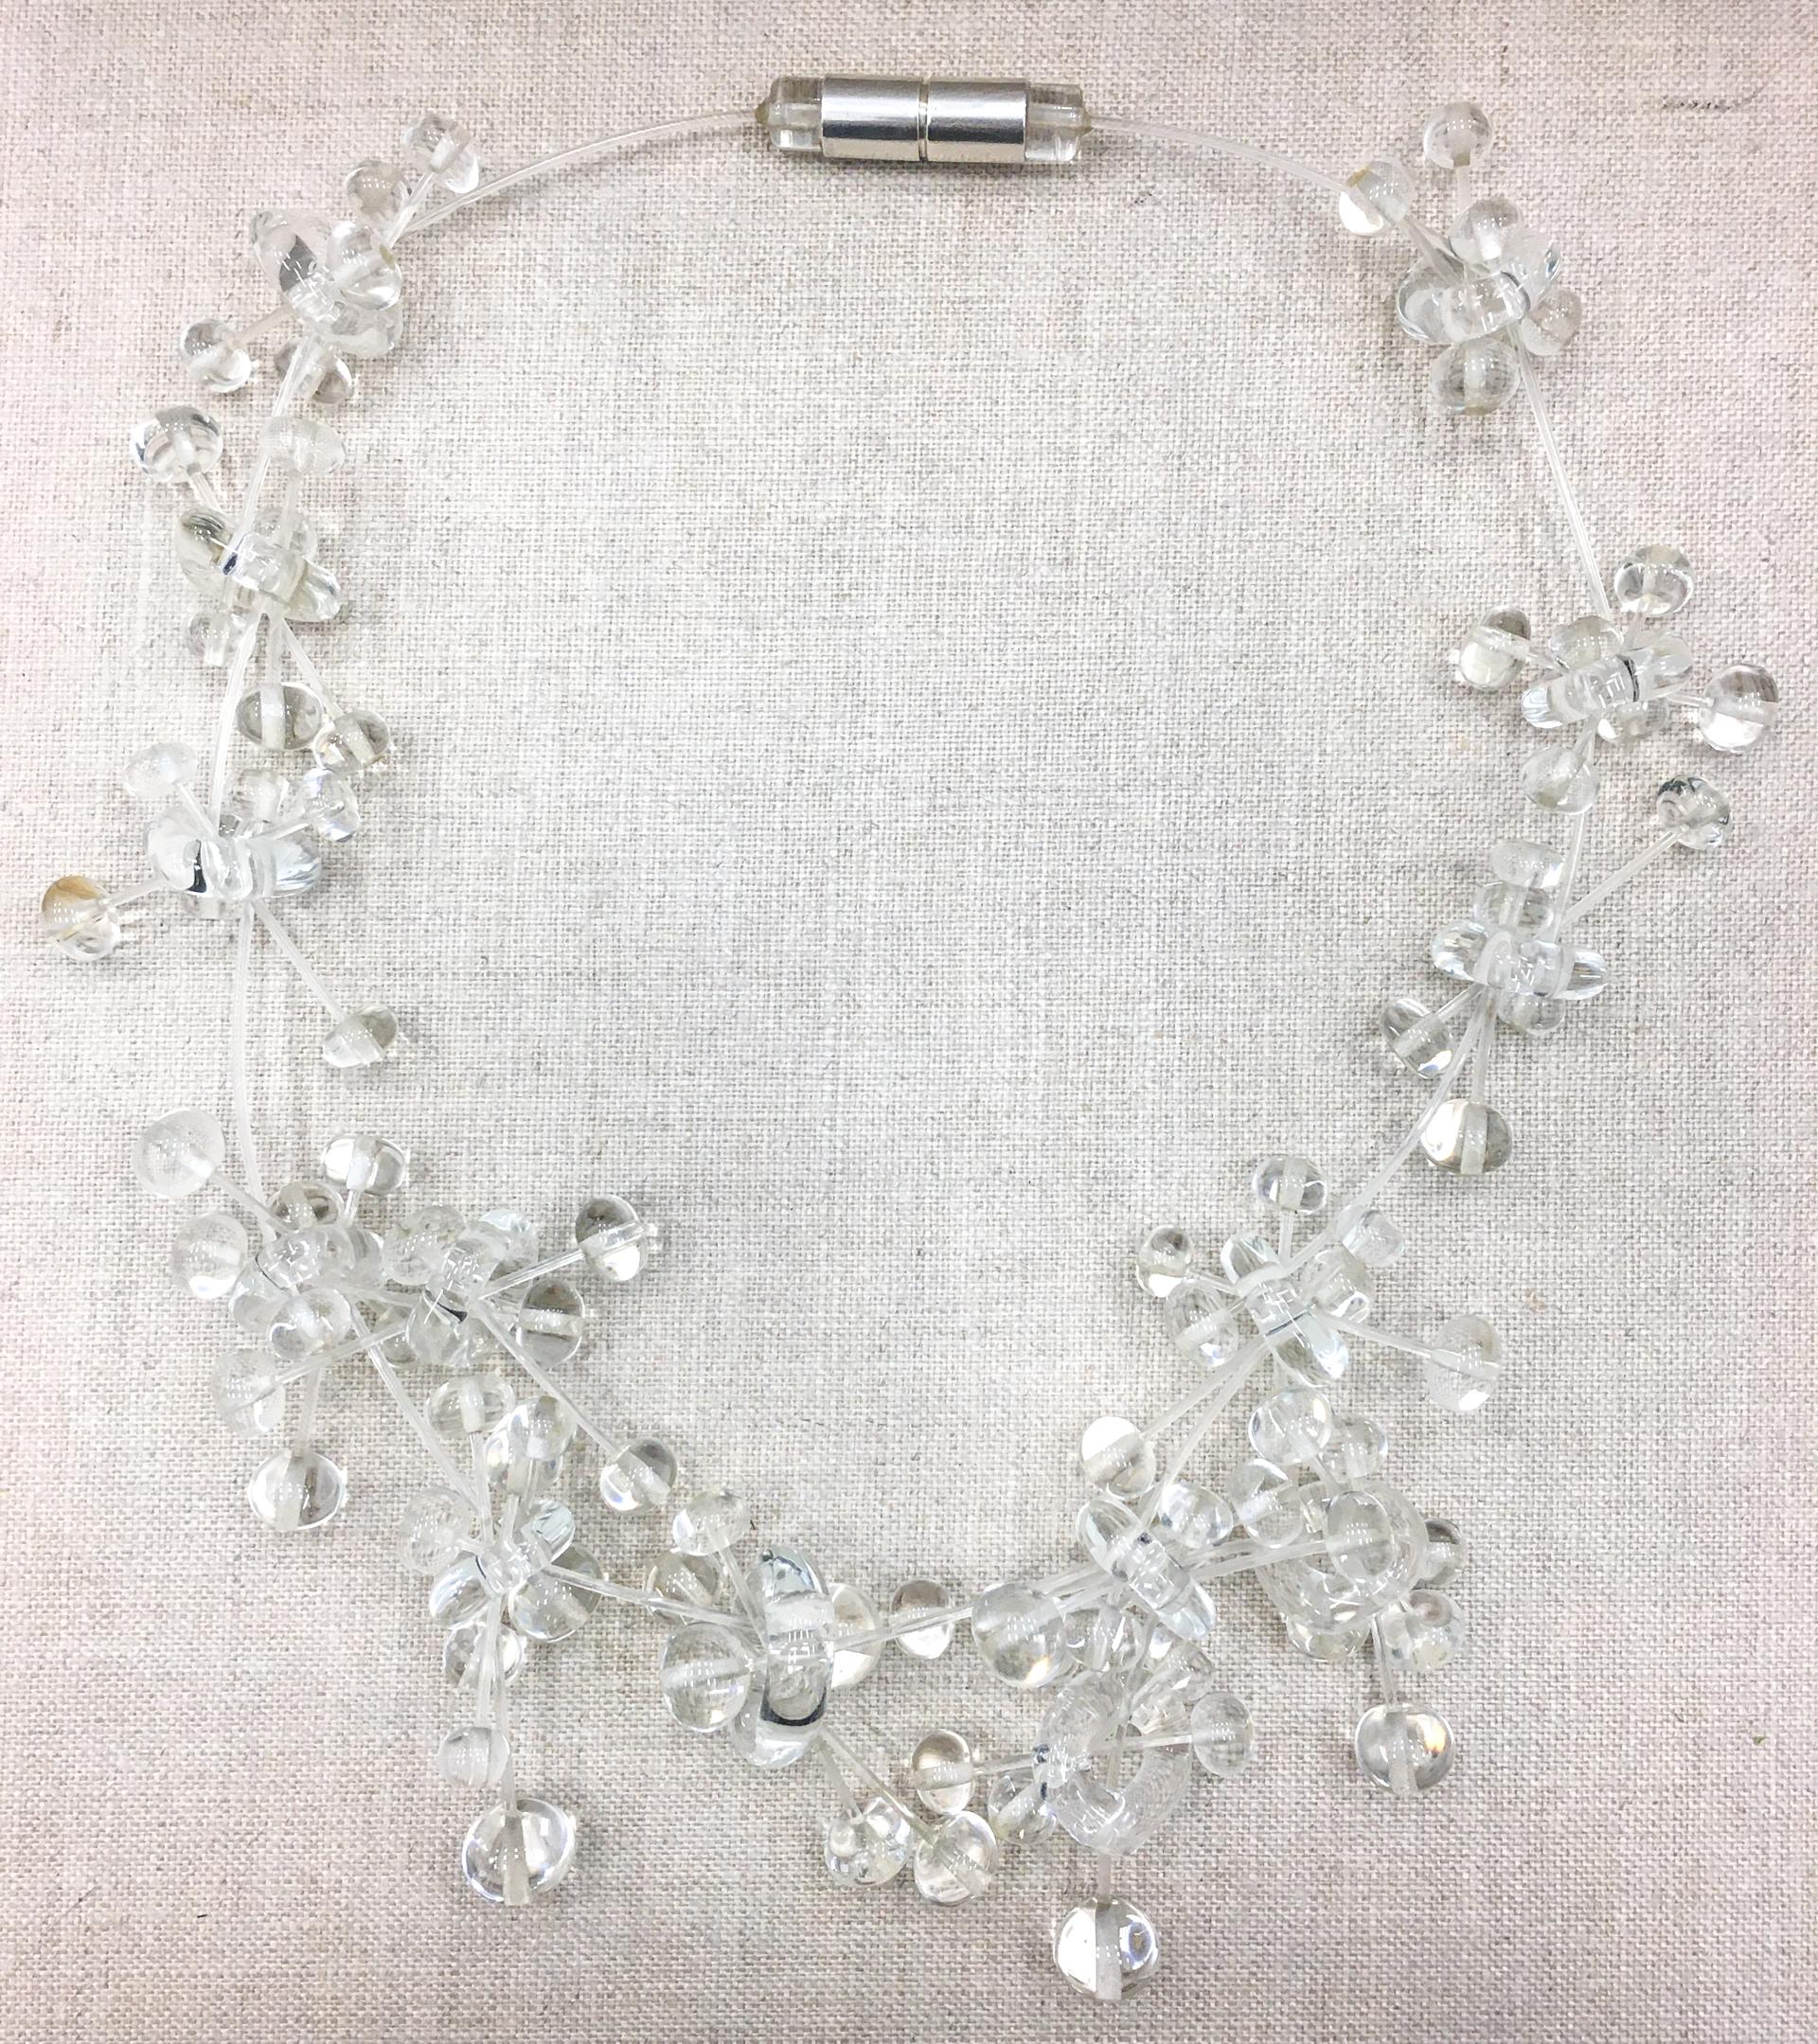 Clasp Necklace No. 4 by Jette Vogt